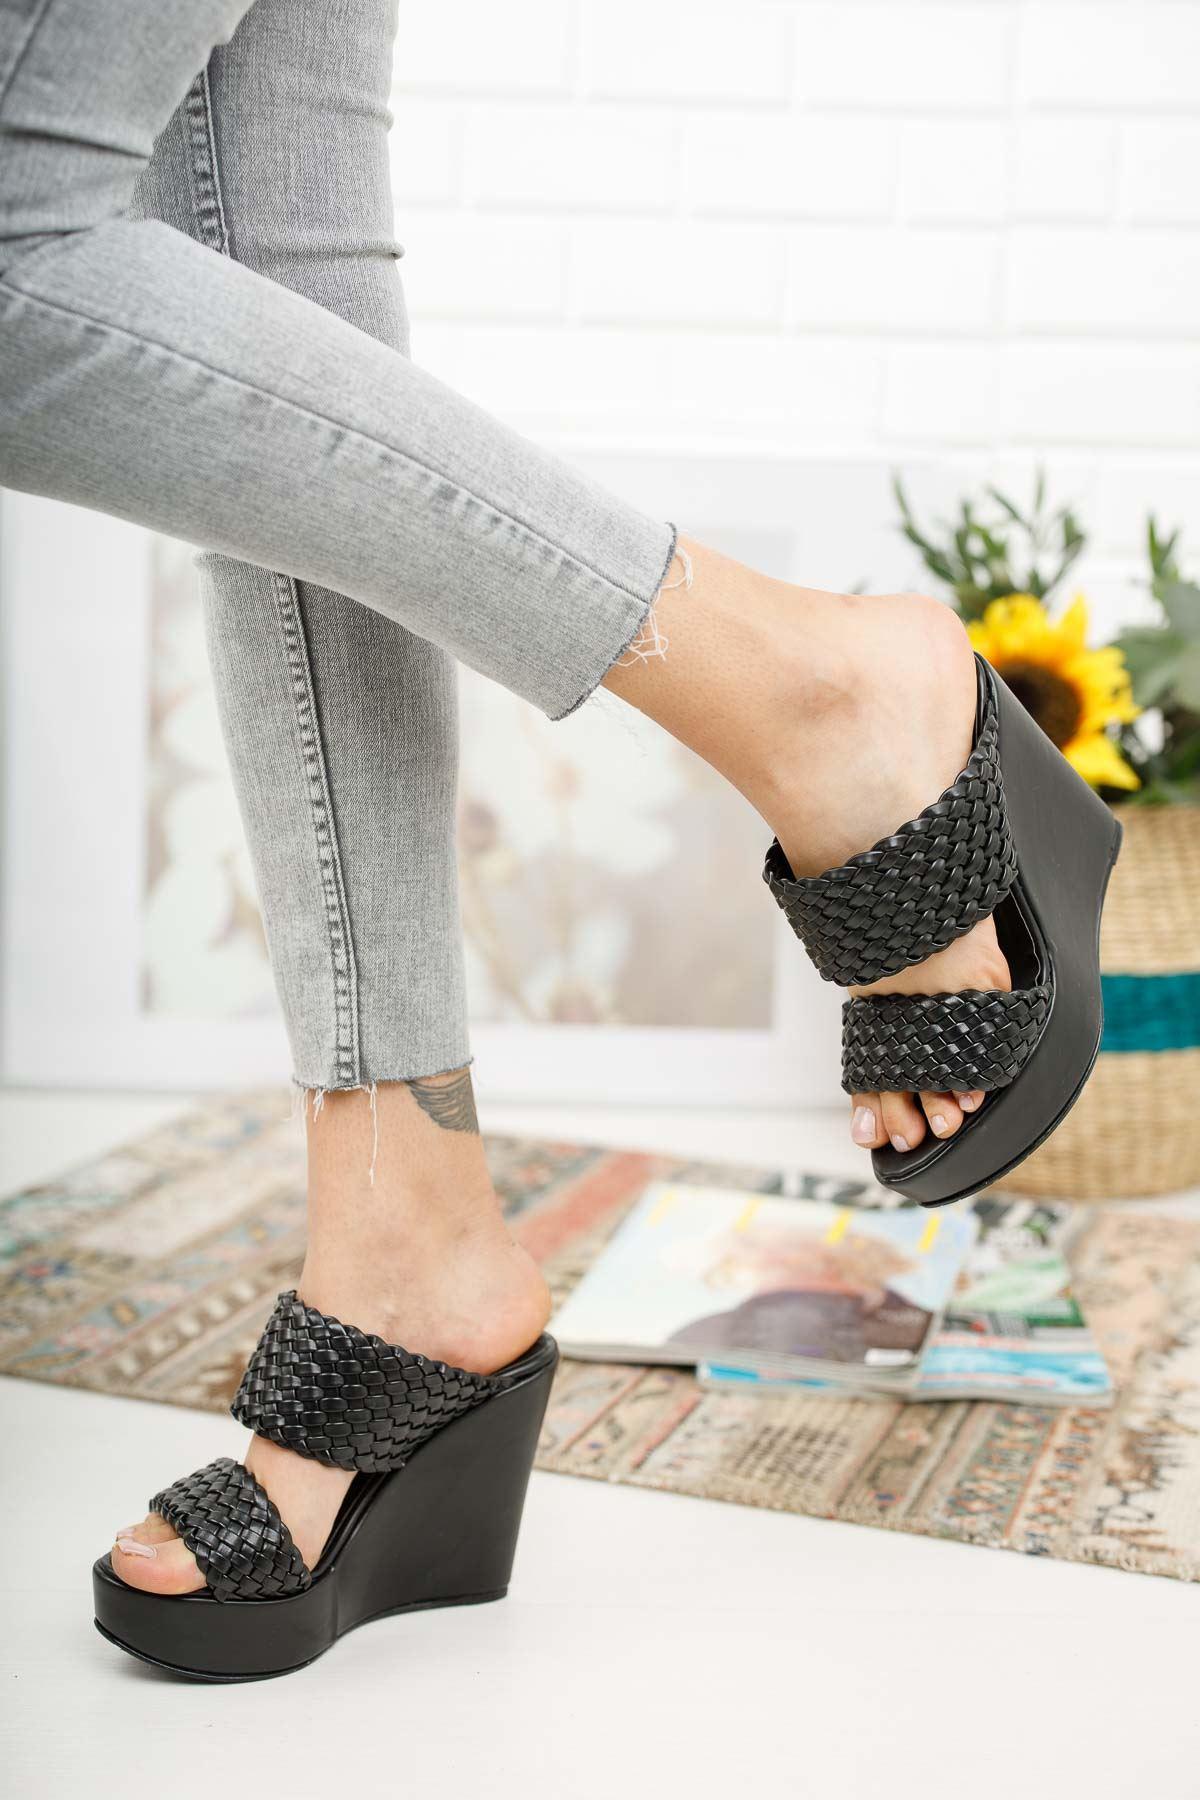 Cornell Siyah Cilt Dolgu Topuklu Kadın Terlik